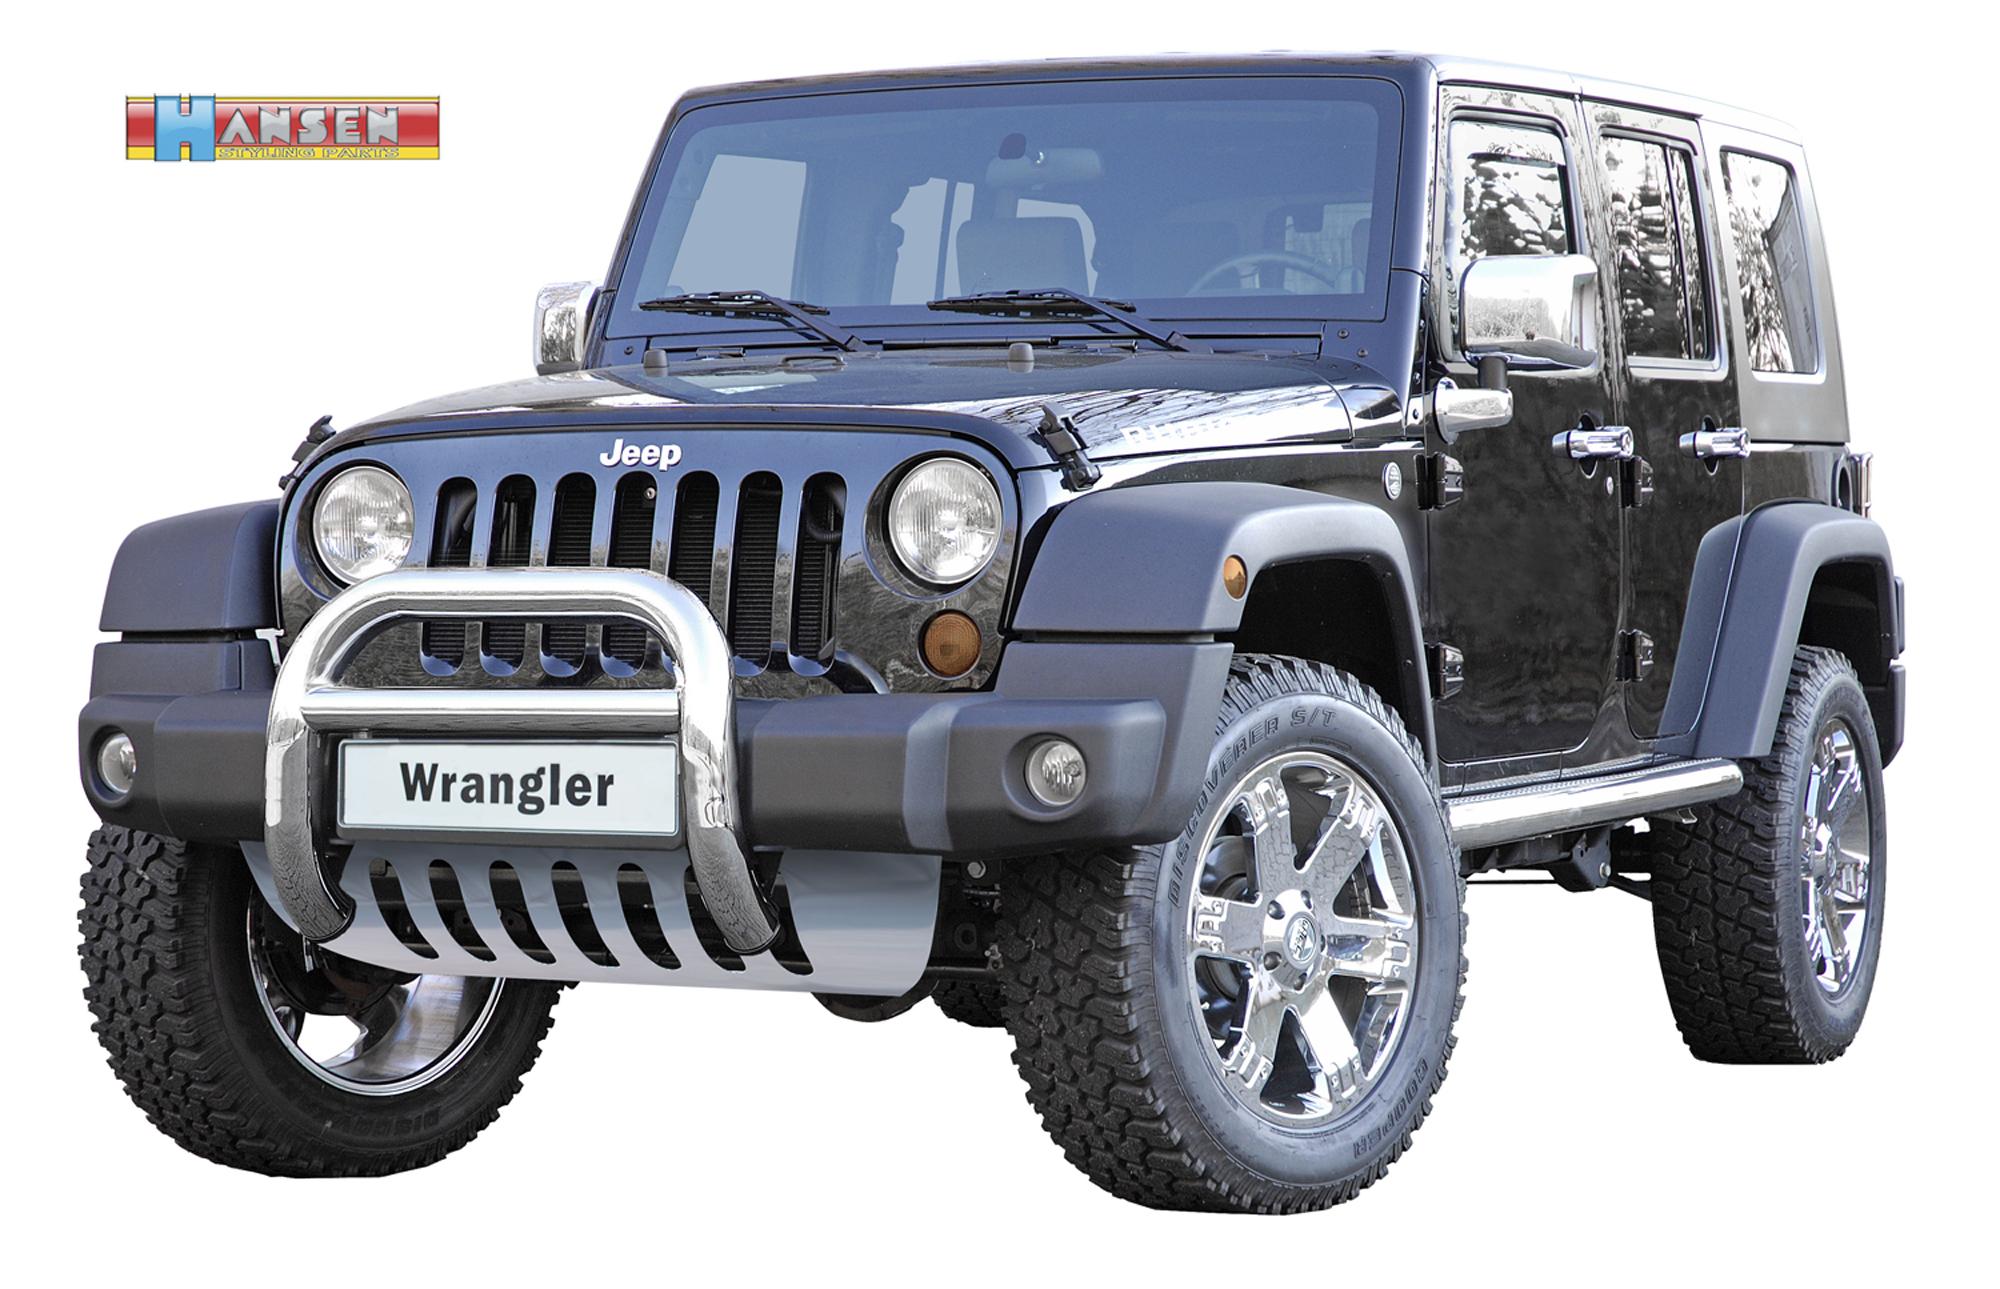 r ckleuchten schutzgitter edelstahl jeep wrangler jk 07. Black Bedroom Furniture Sets. Home Design Ideas